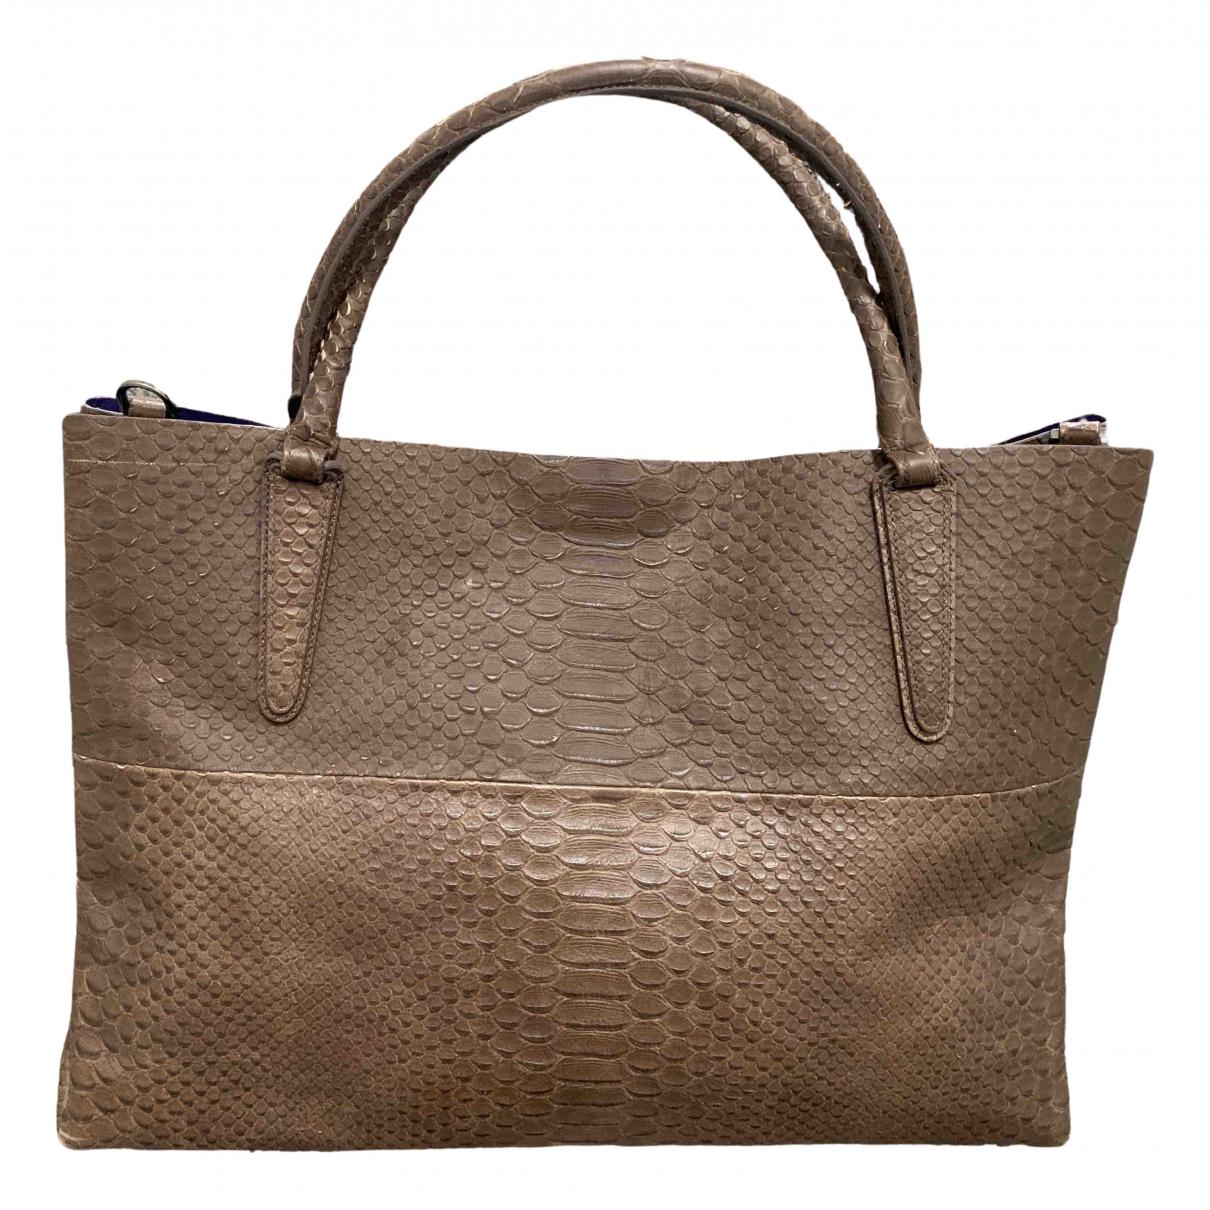 Coach Borough Bag Brown Leather handbag for Women N